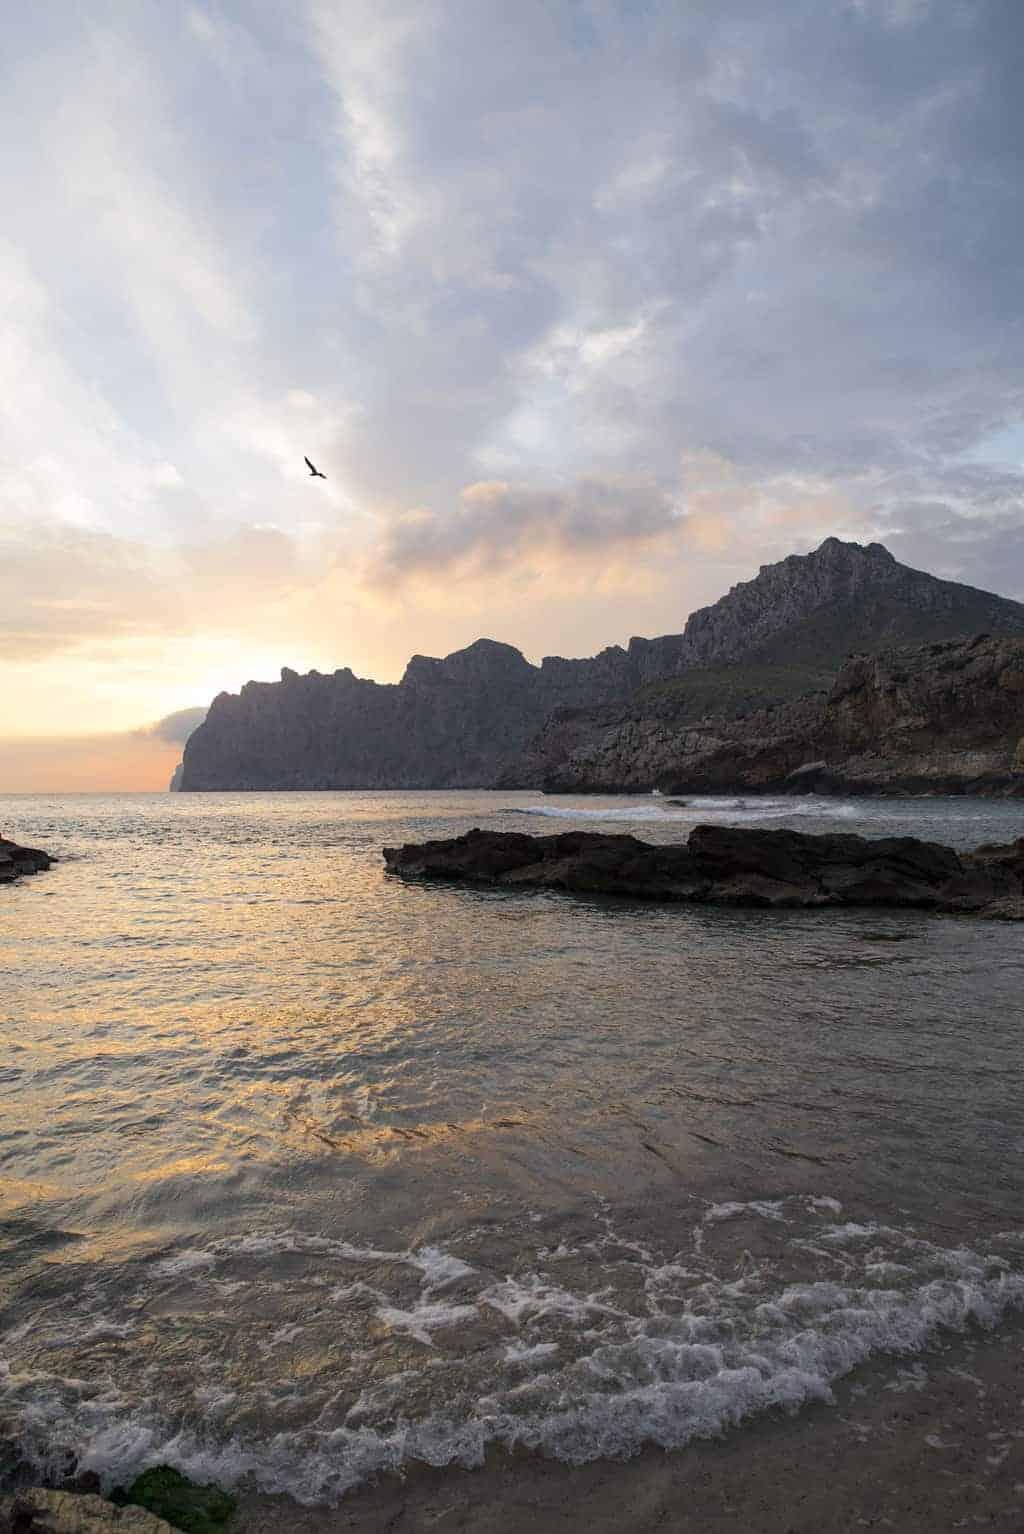 Sunrise on the beach in Mallorca